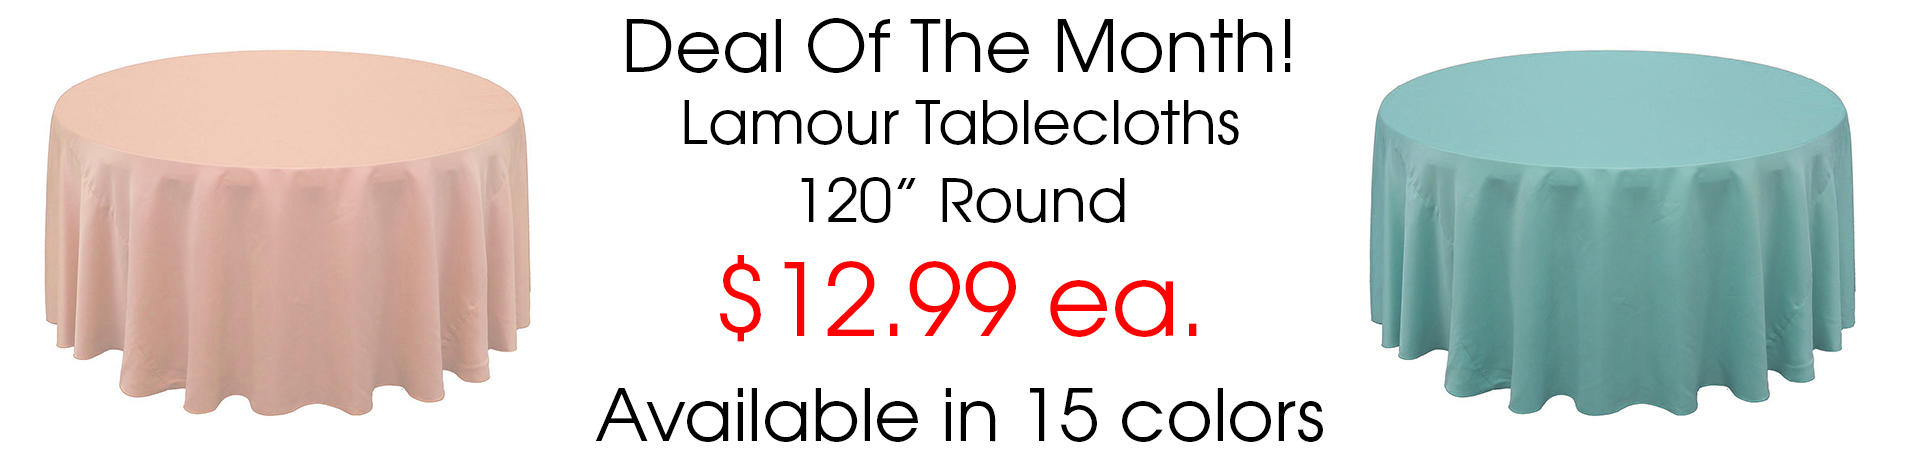 Lamour tablecloths